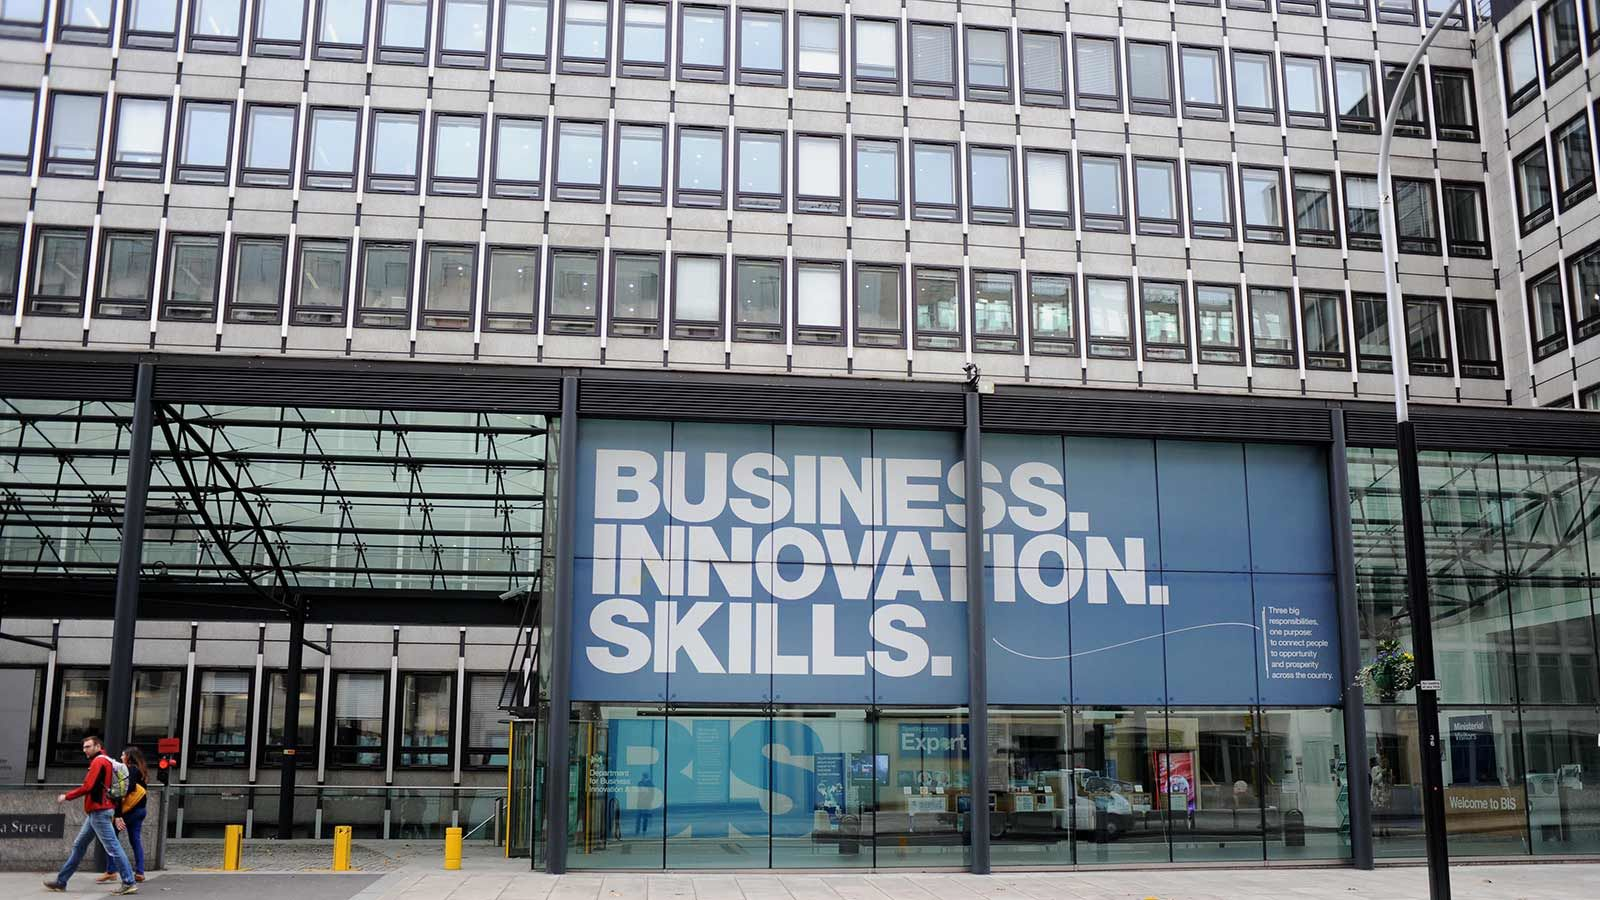 Estate Transition Programme, Business Innovation Skills Banner - Mace Group